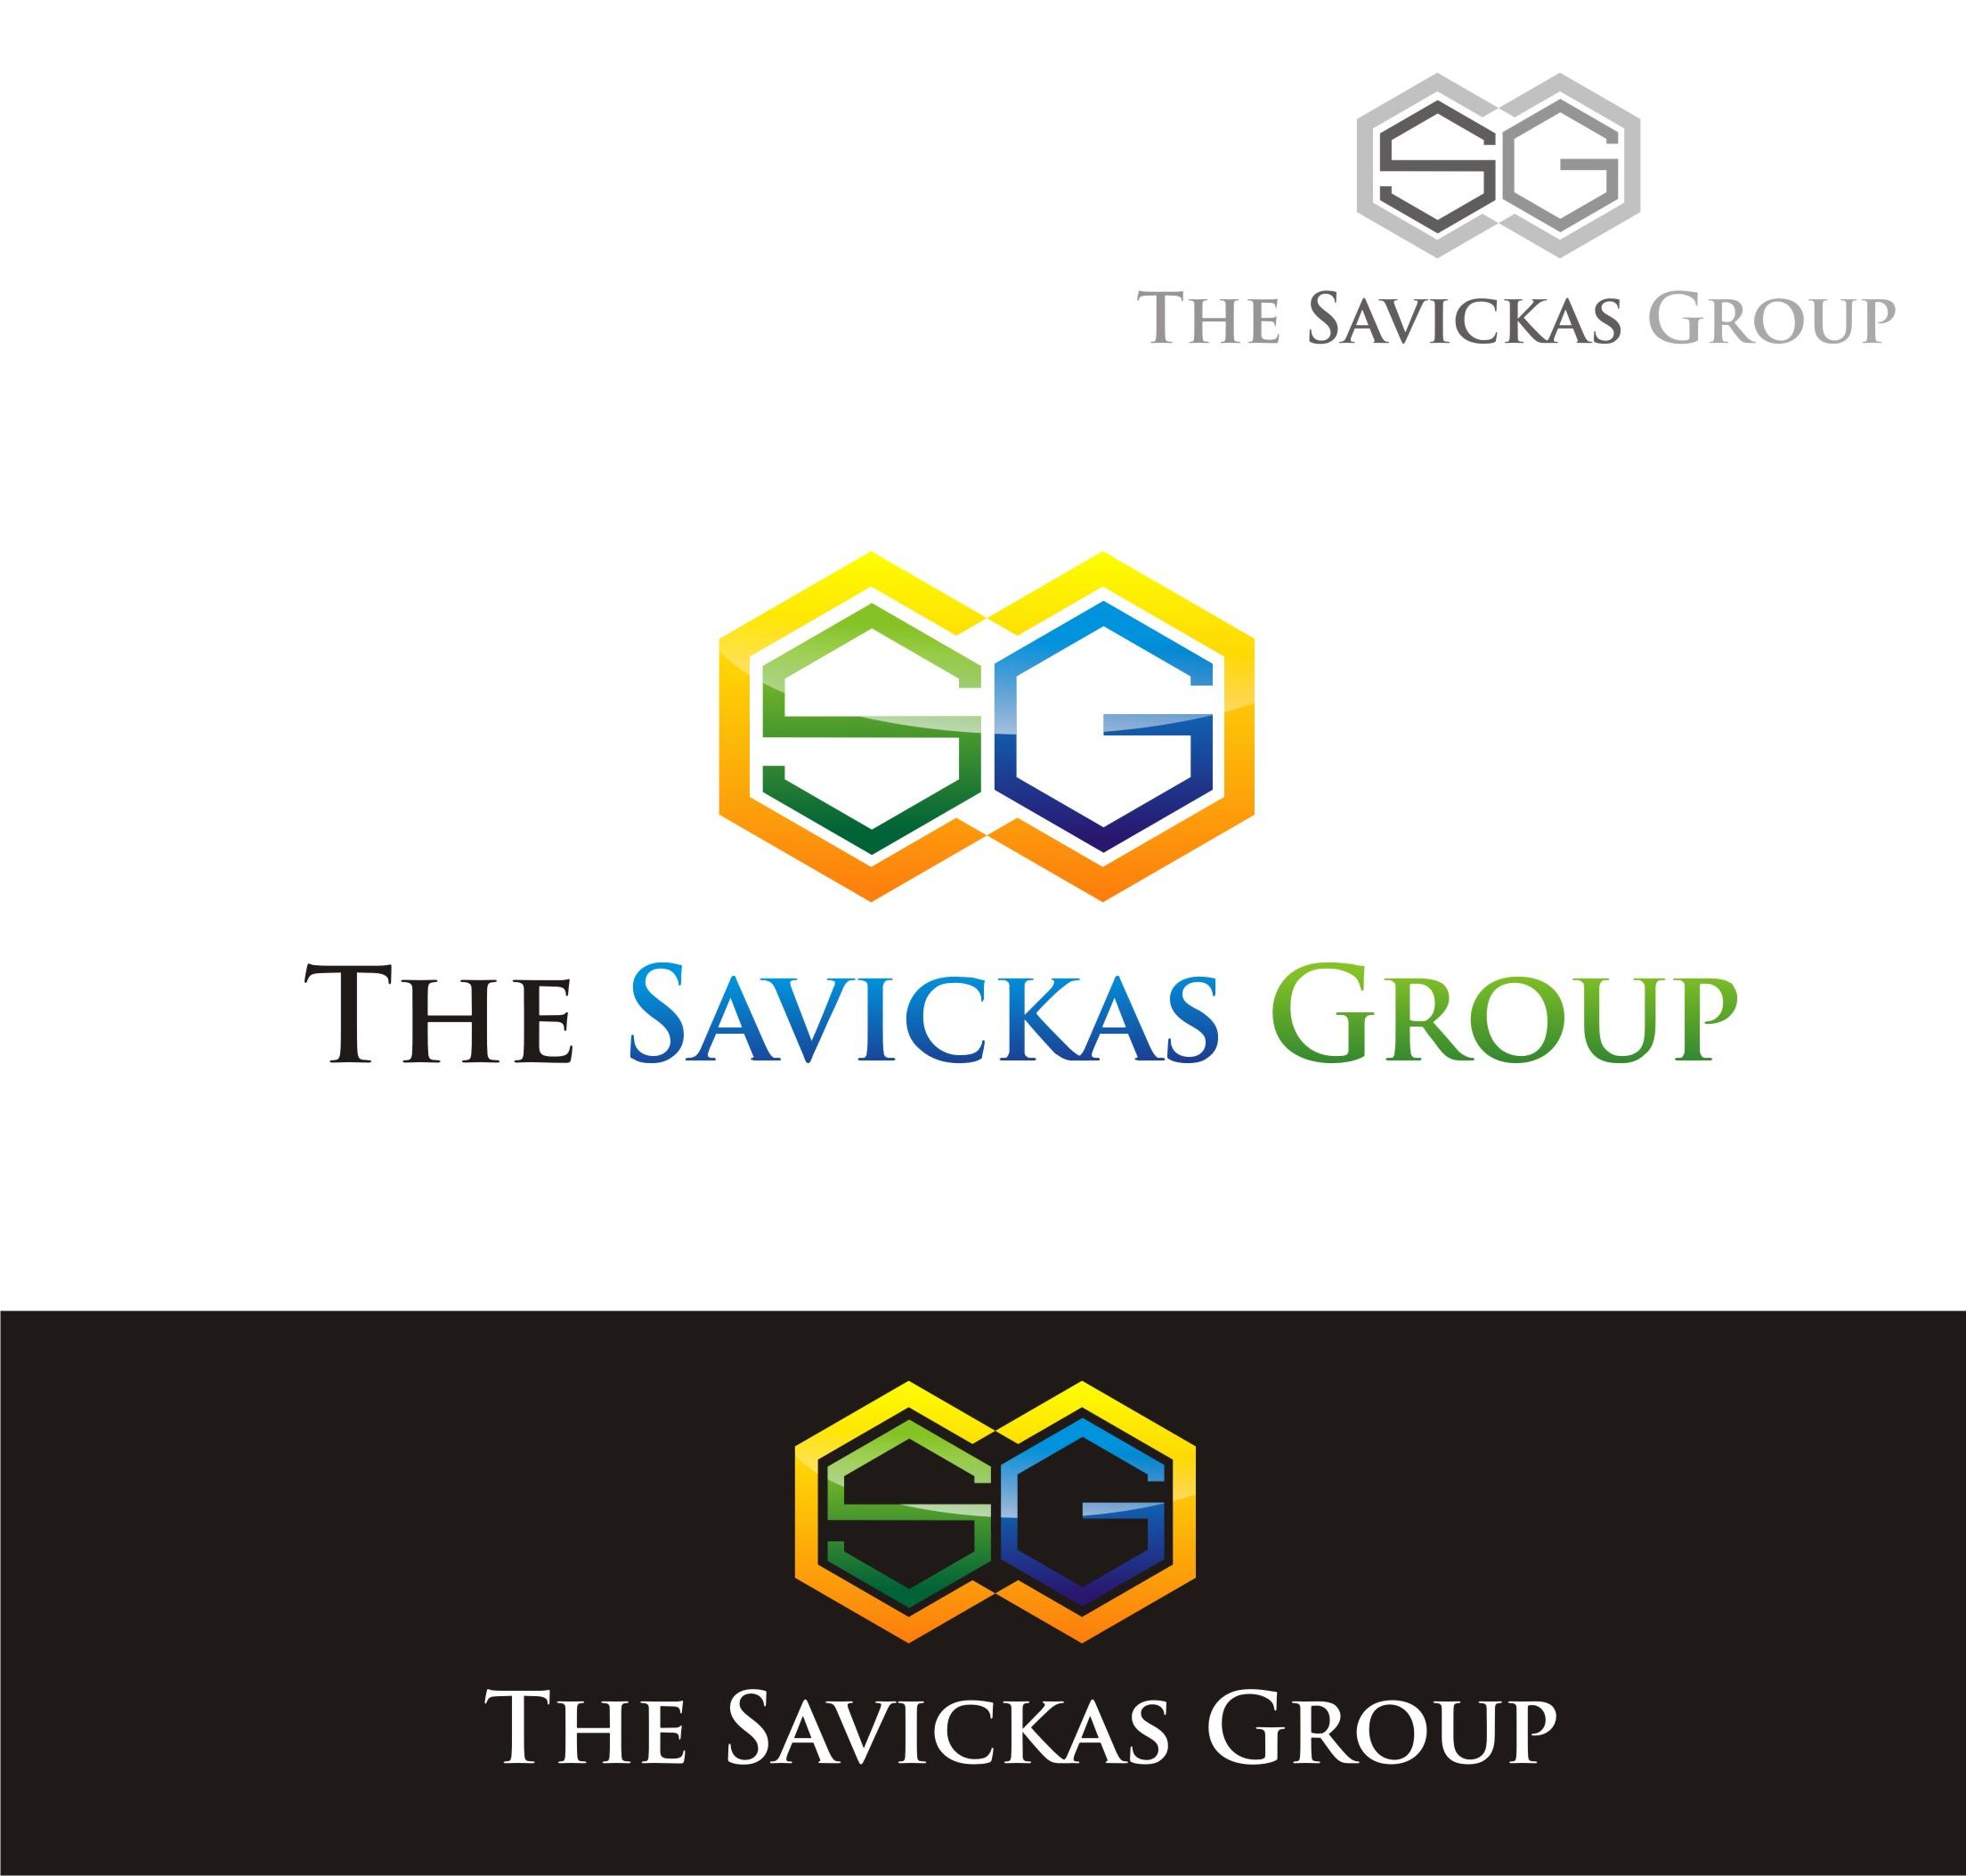 Logo Design by Felik Lahima Rahman - Entry No. 128 in the Logo Design Contest Logo Design Needed for Exciting New Company The Savickas Group.